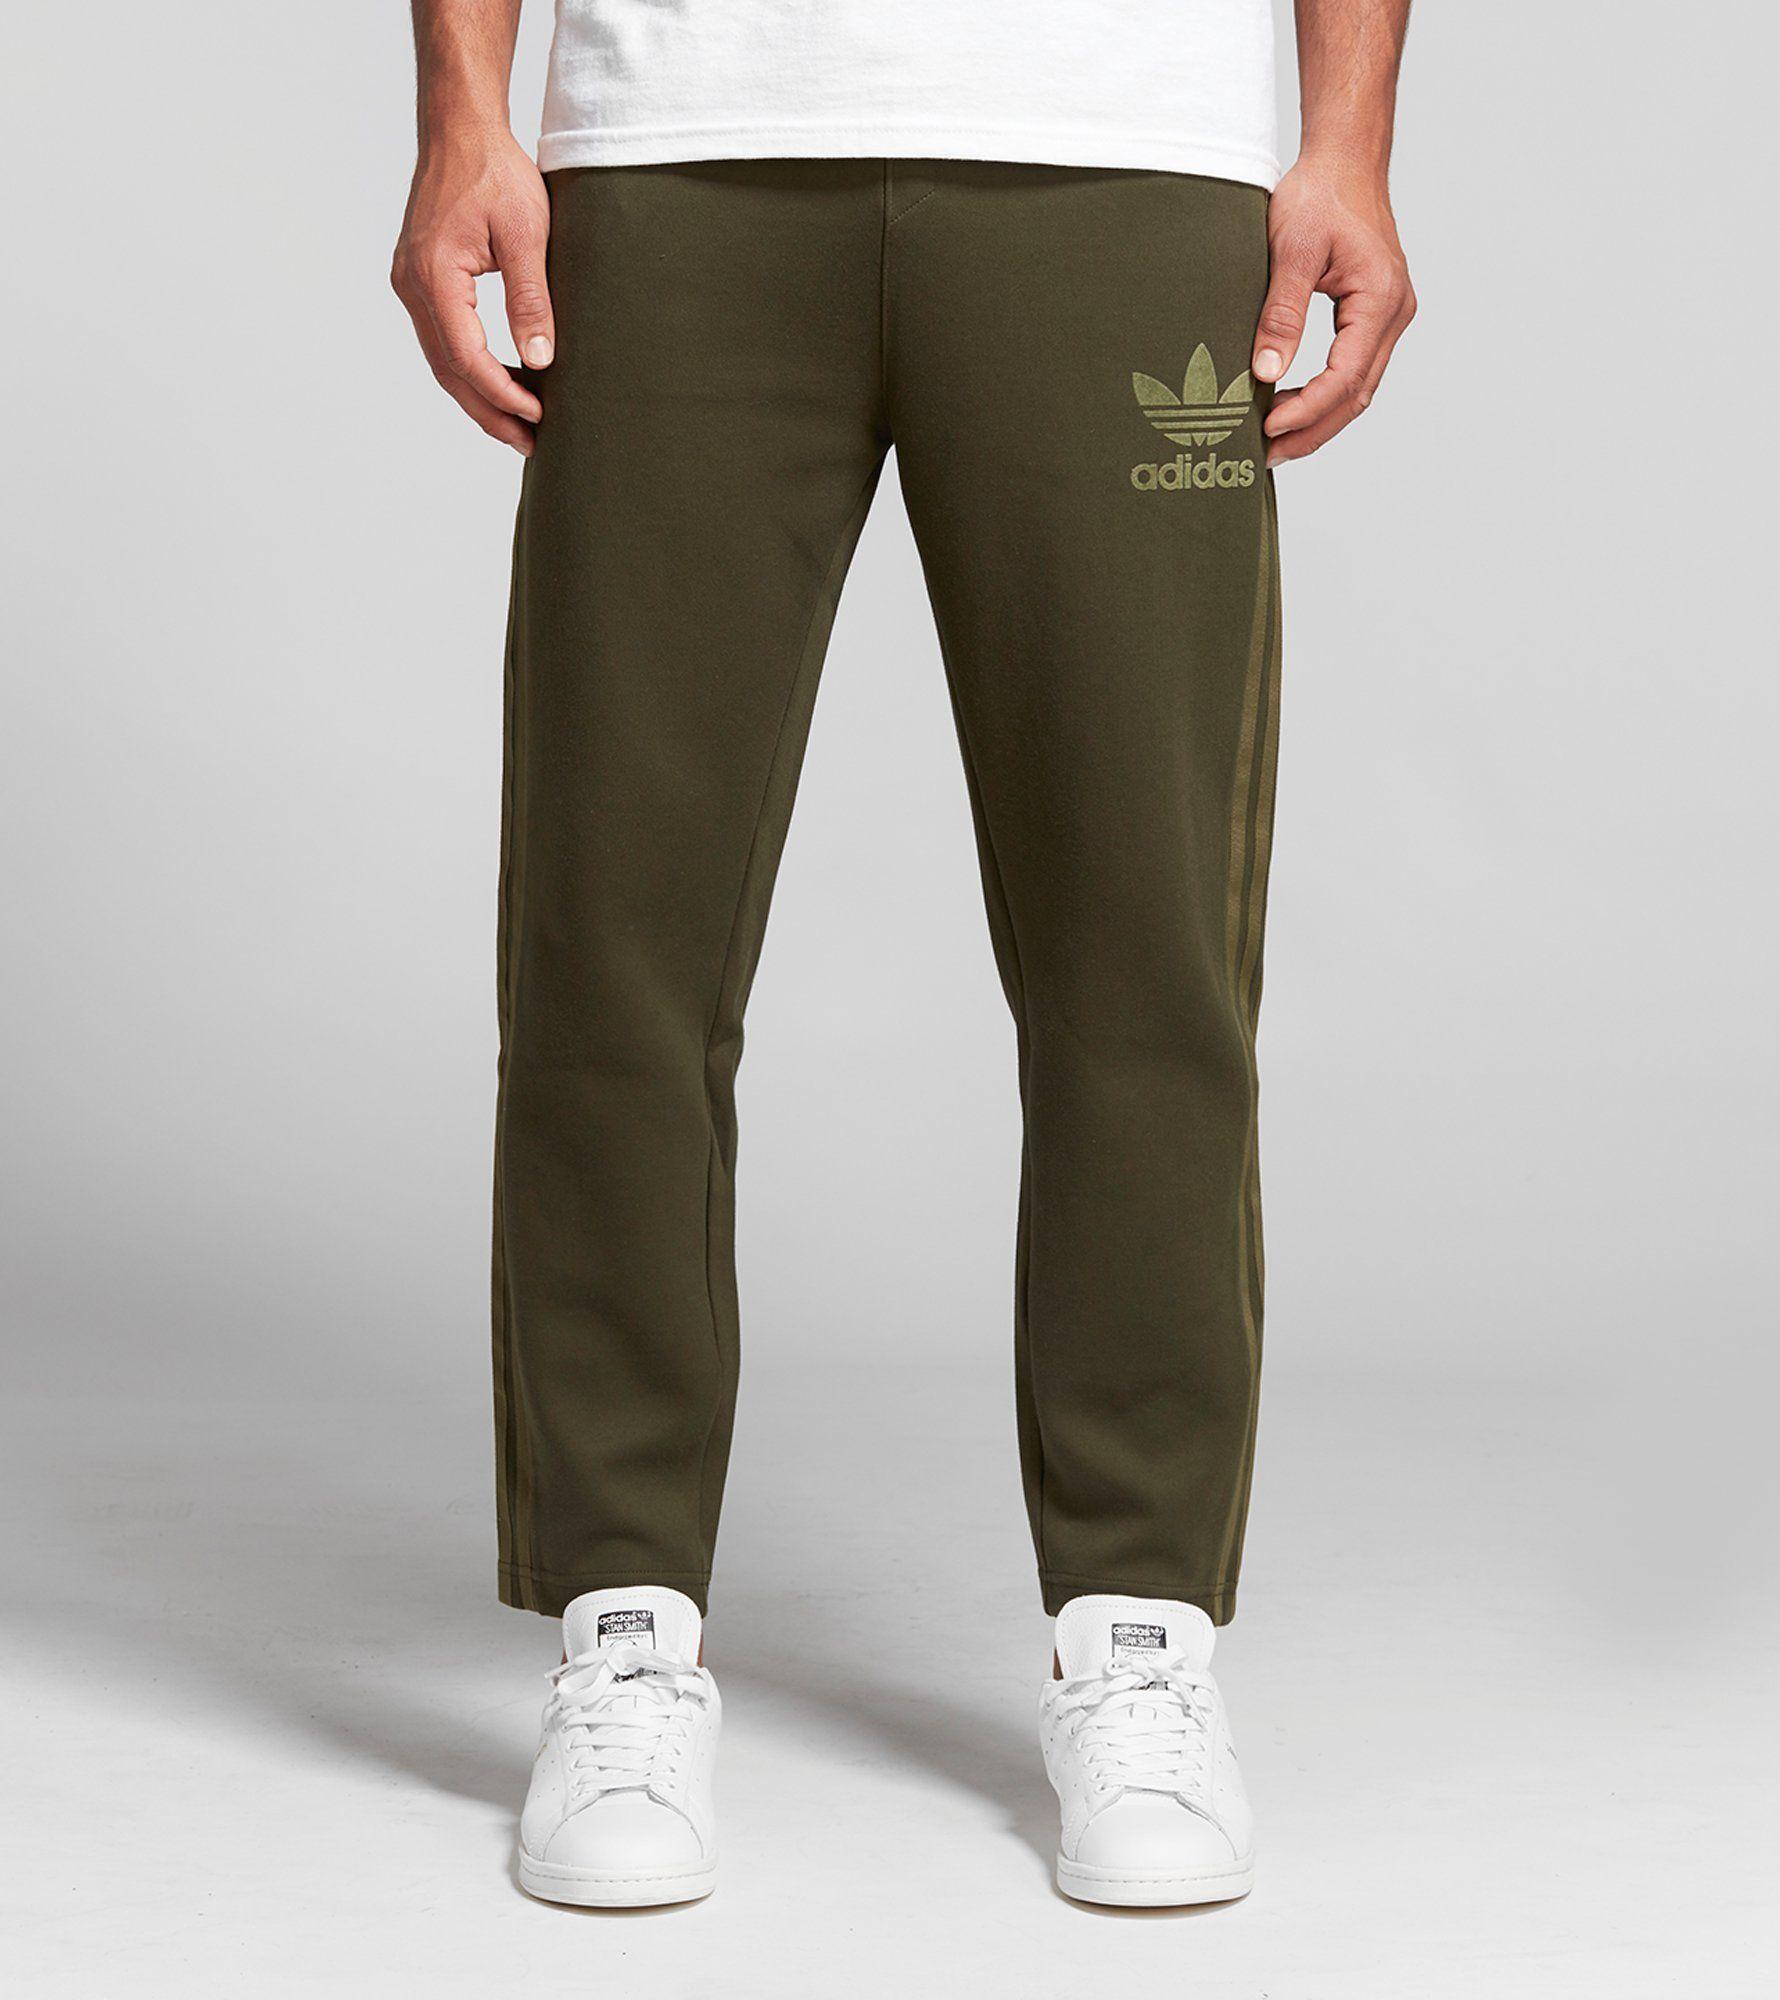 8074c095b7bc adidas Originals adicolor Skinny Track Pants